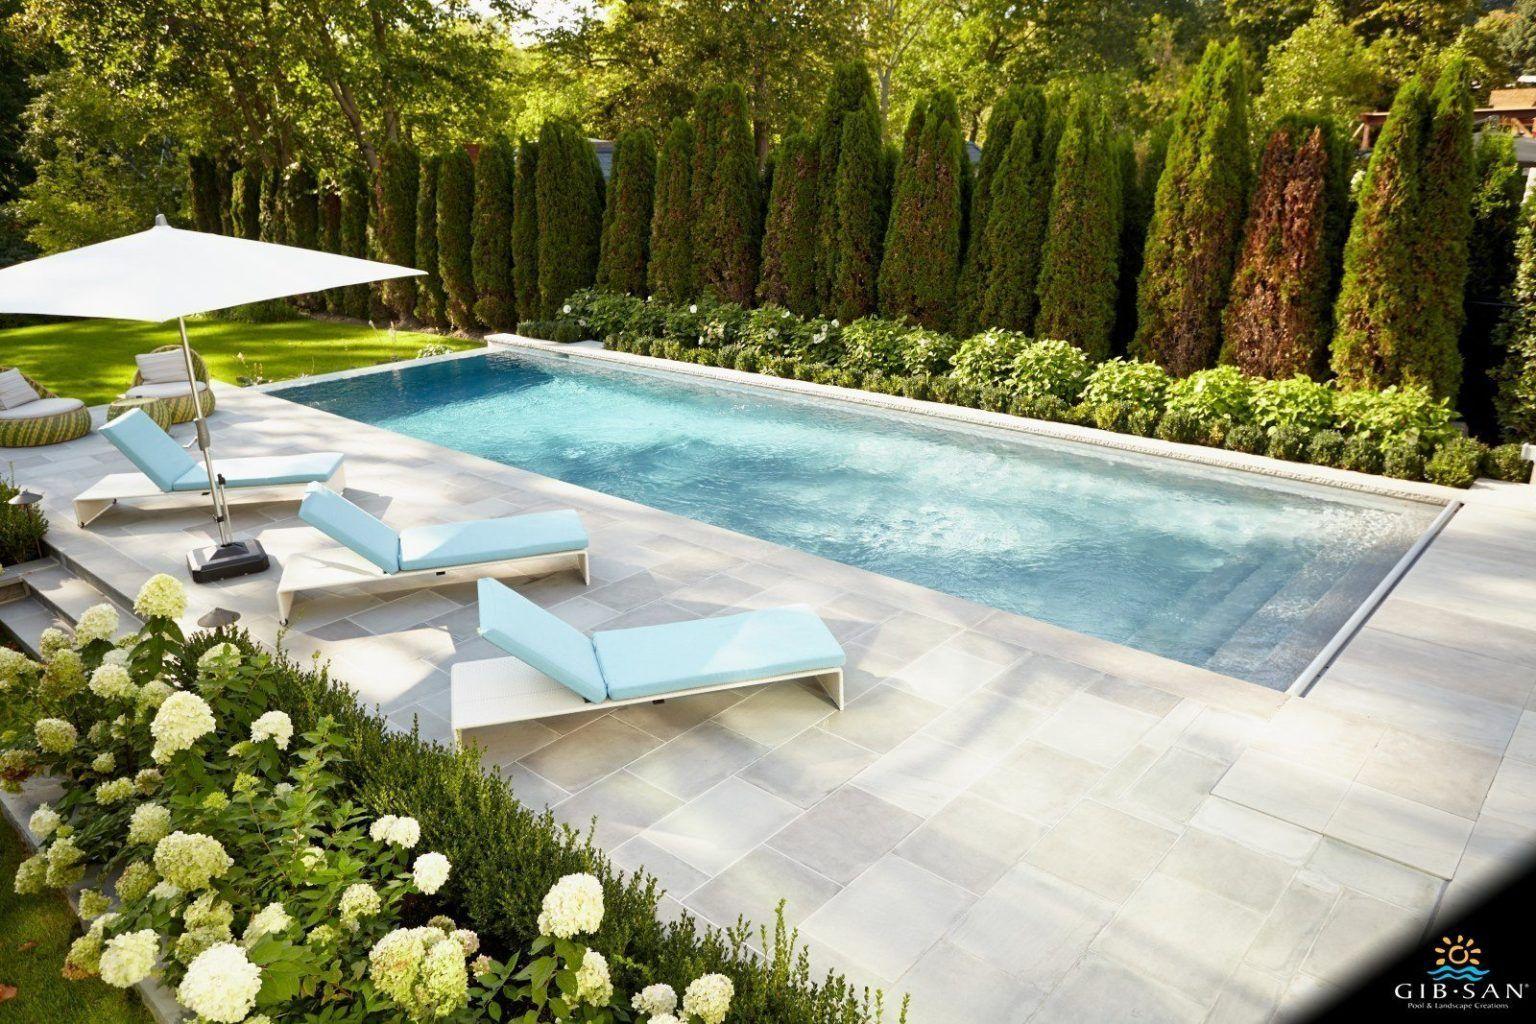 Custom Concrete Pools | Gib-San Pools | Toronto, Mississauga, Oakville